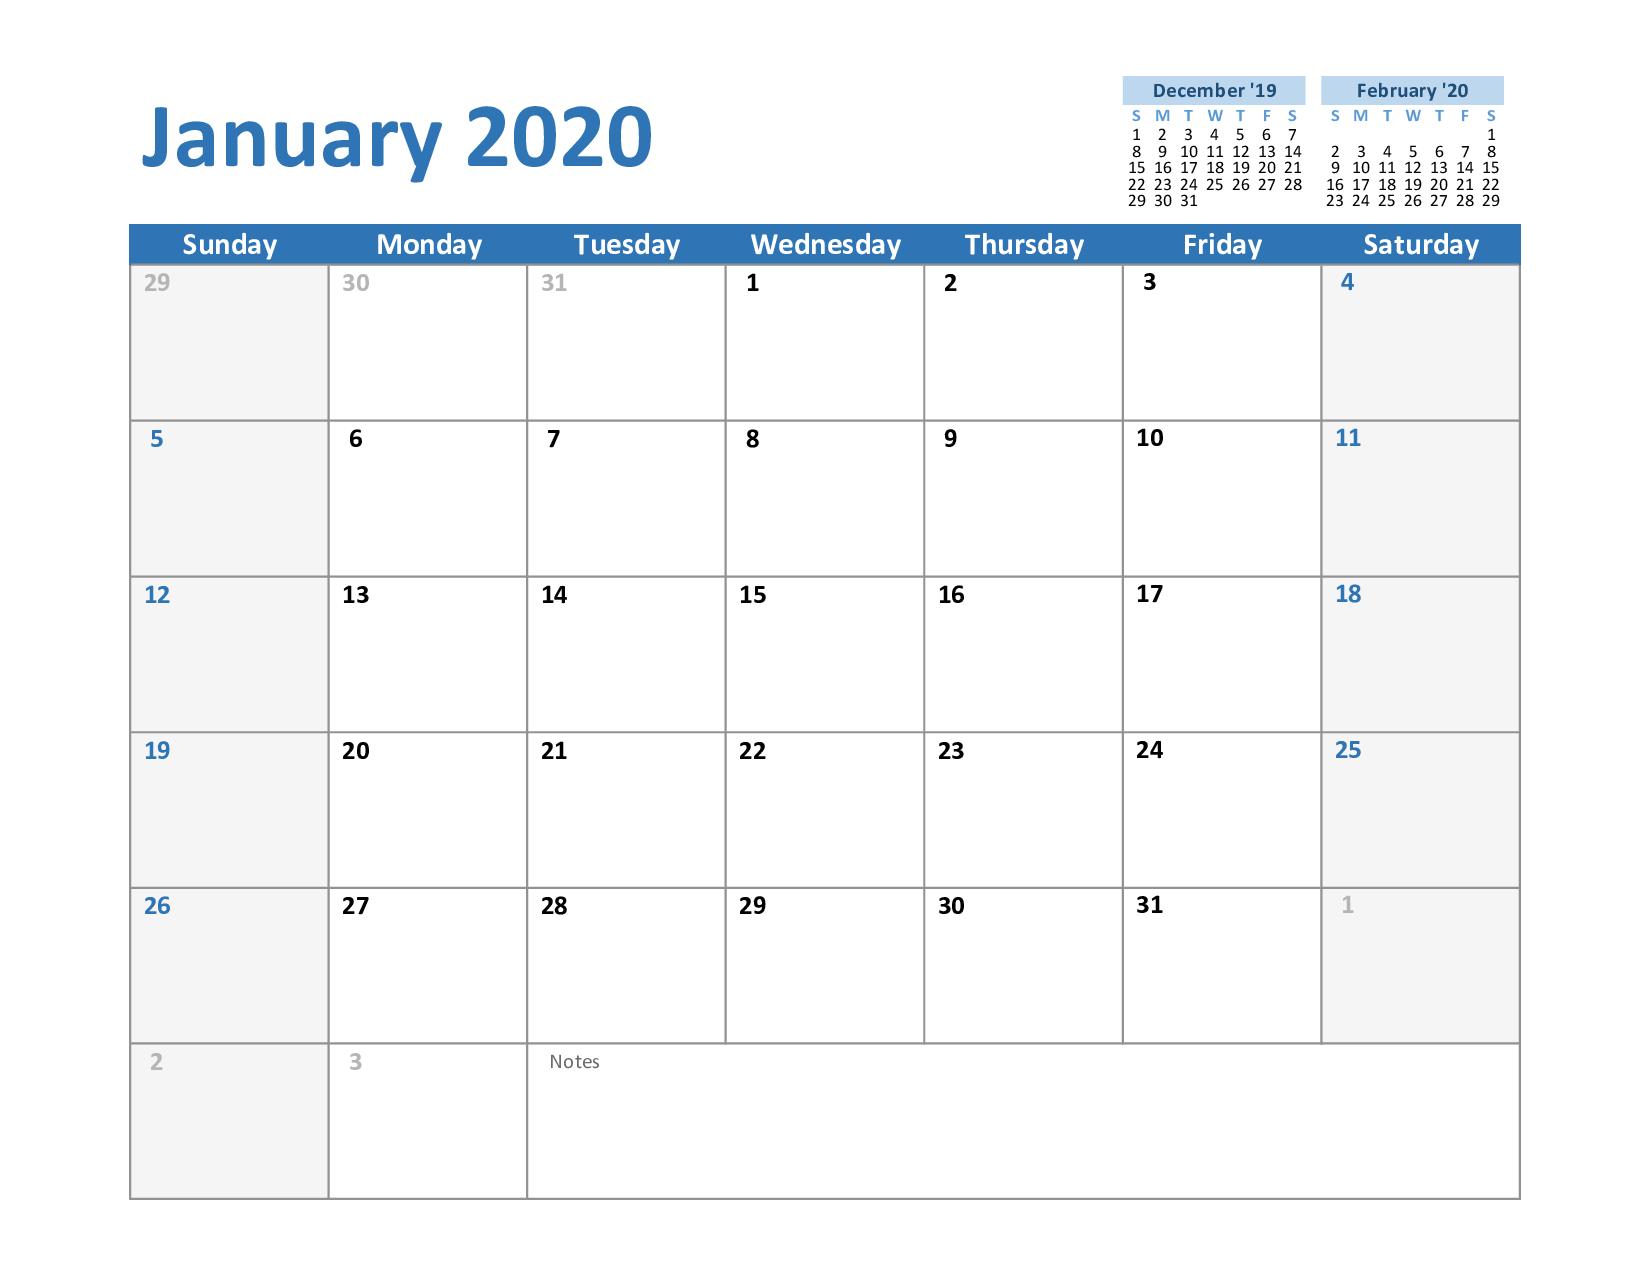 Free January Calendar 2020 Printable Template Blank In Pdf regarding 2020 December Calendar 8 X11 Printable